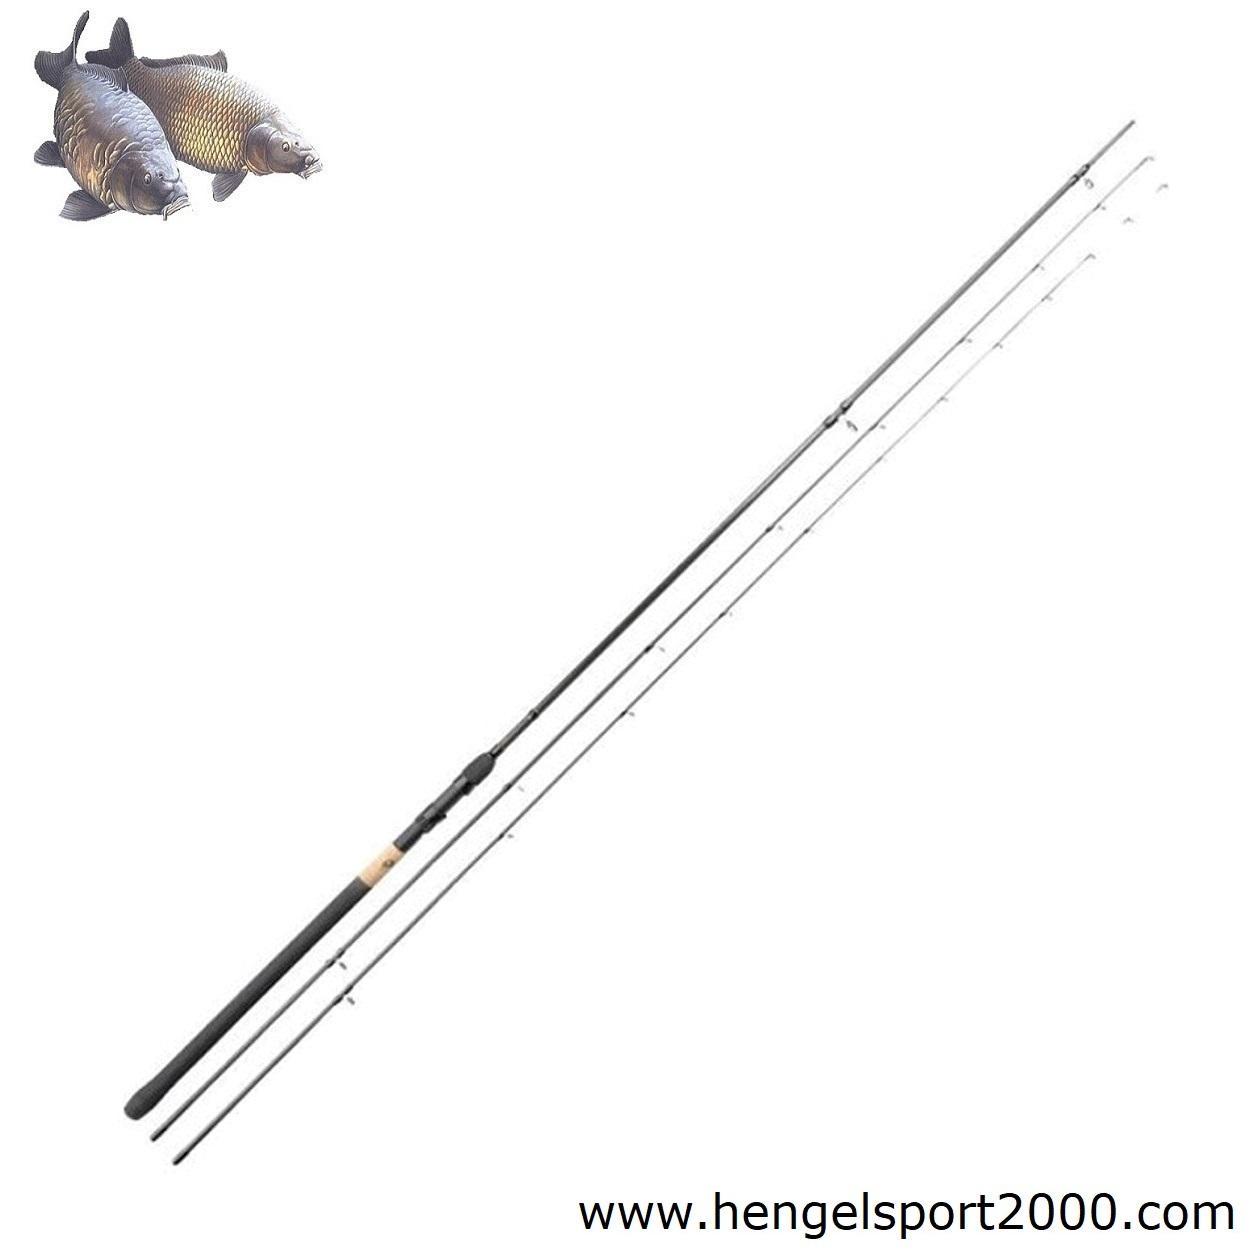 Prologic MP Detek Twin Tip Rod 12ft - 1,75lbs